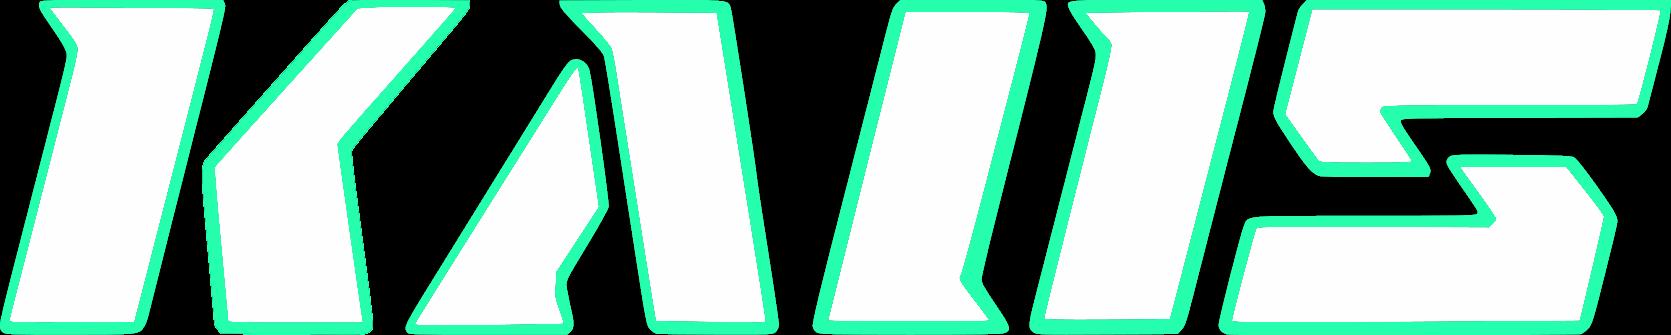 Kaos logo